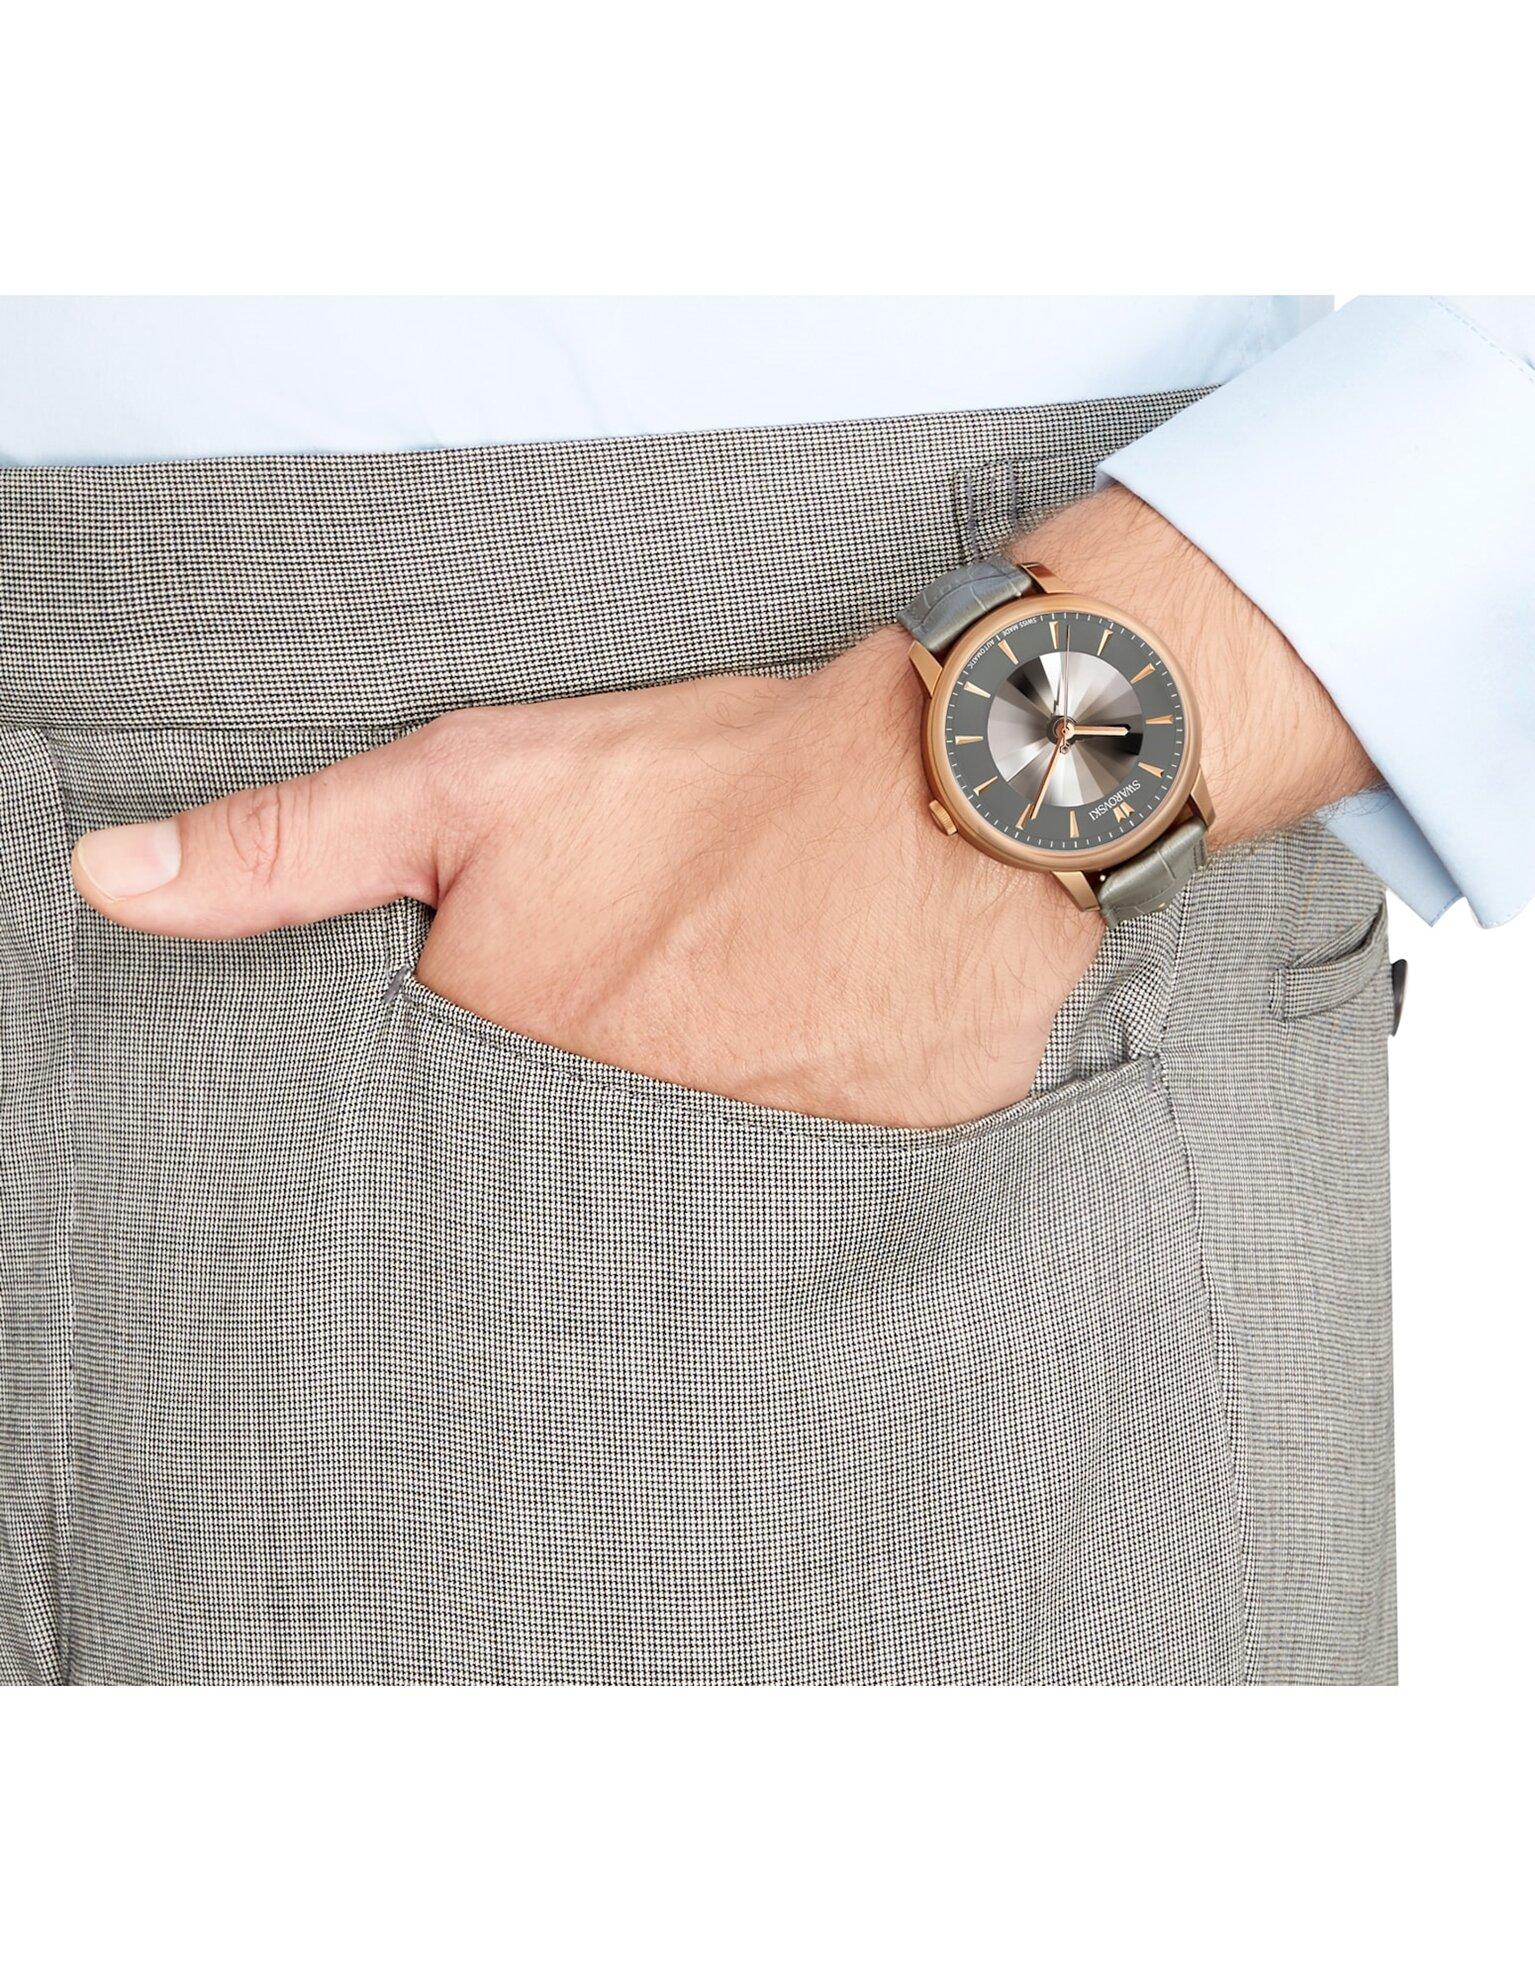 Picture of Atlantis Limited Edition Automatic Men's Saat, Gri, Pembe altın rengi PVD